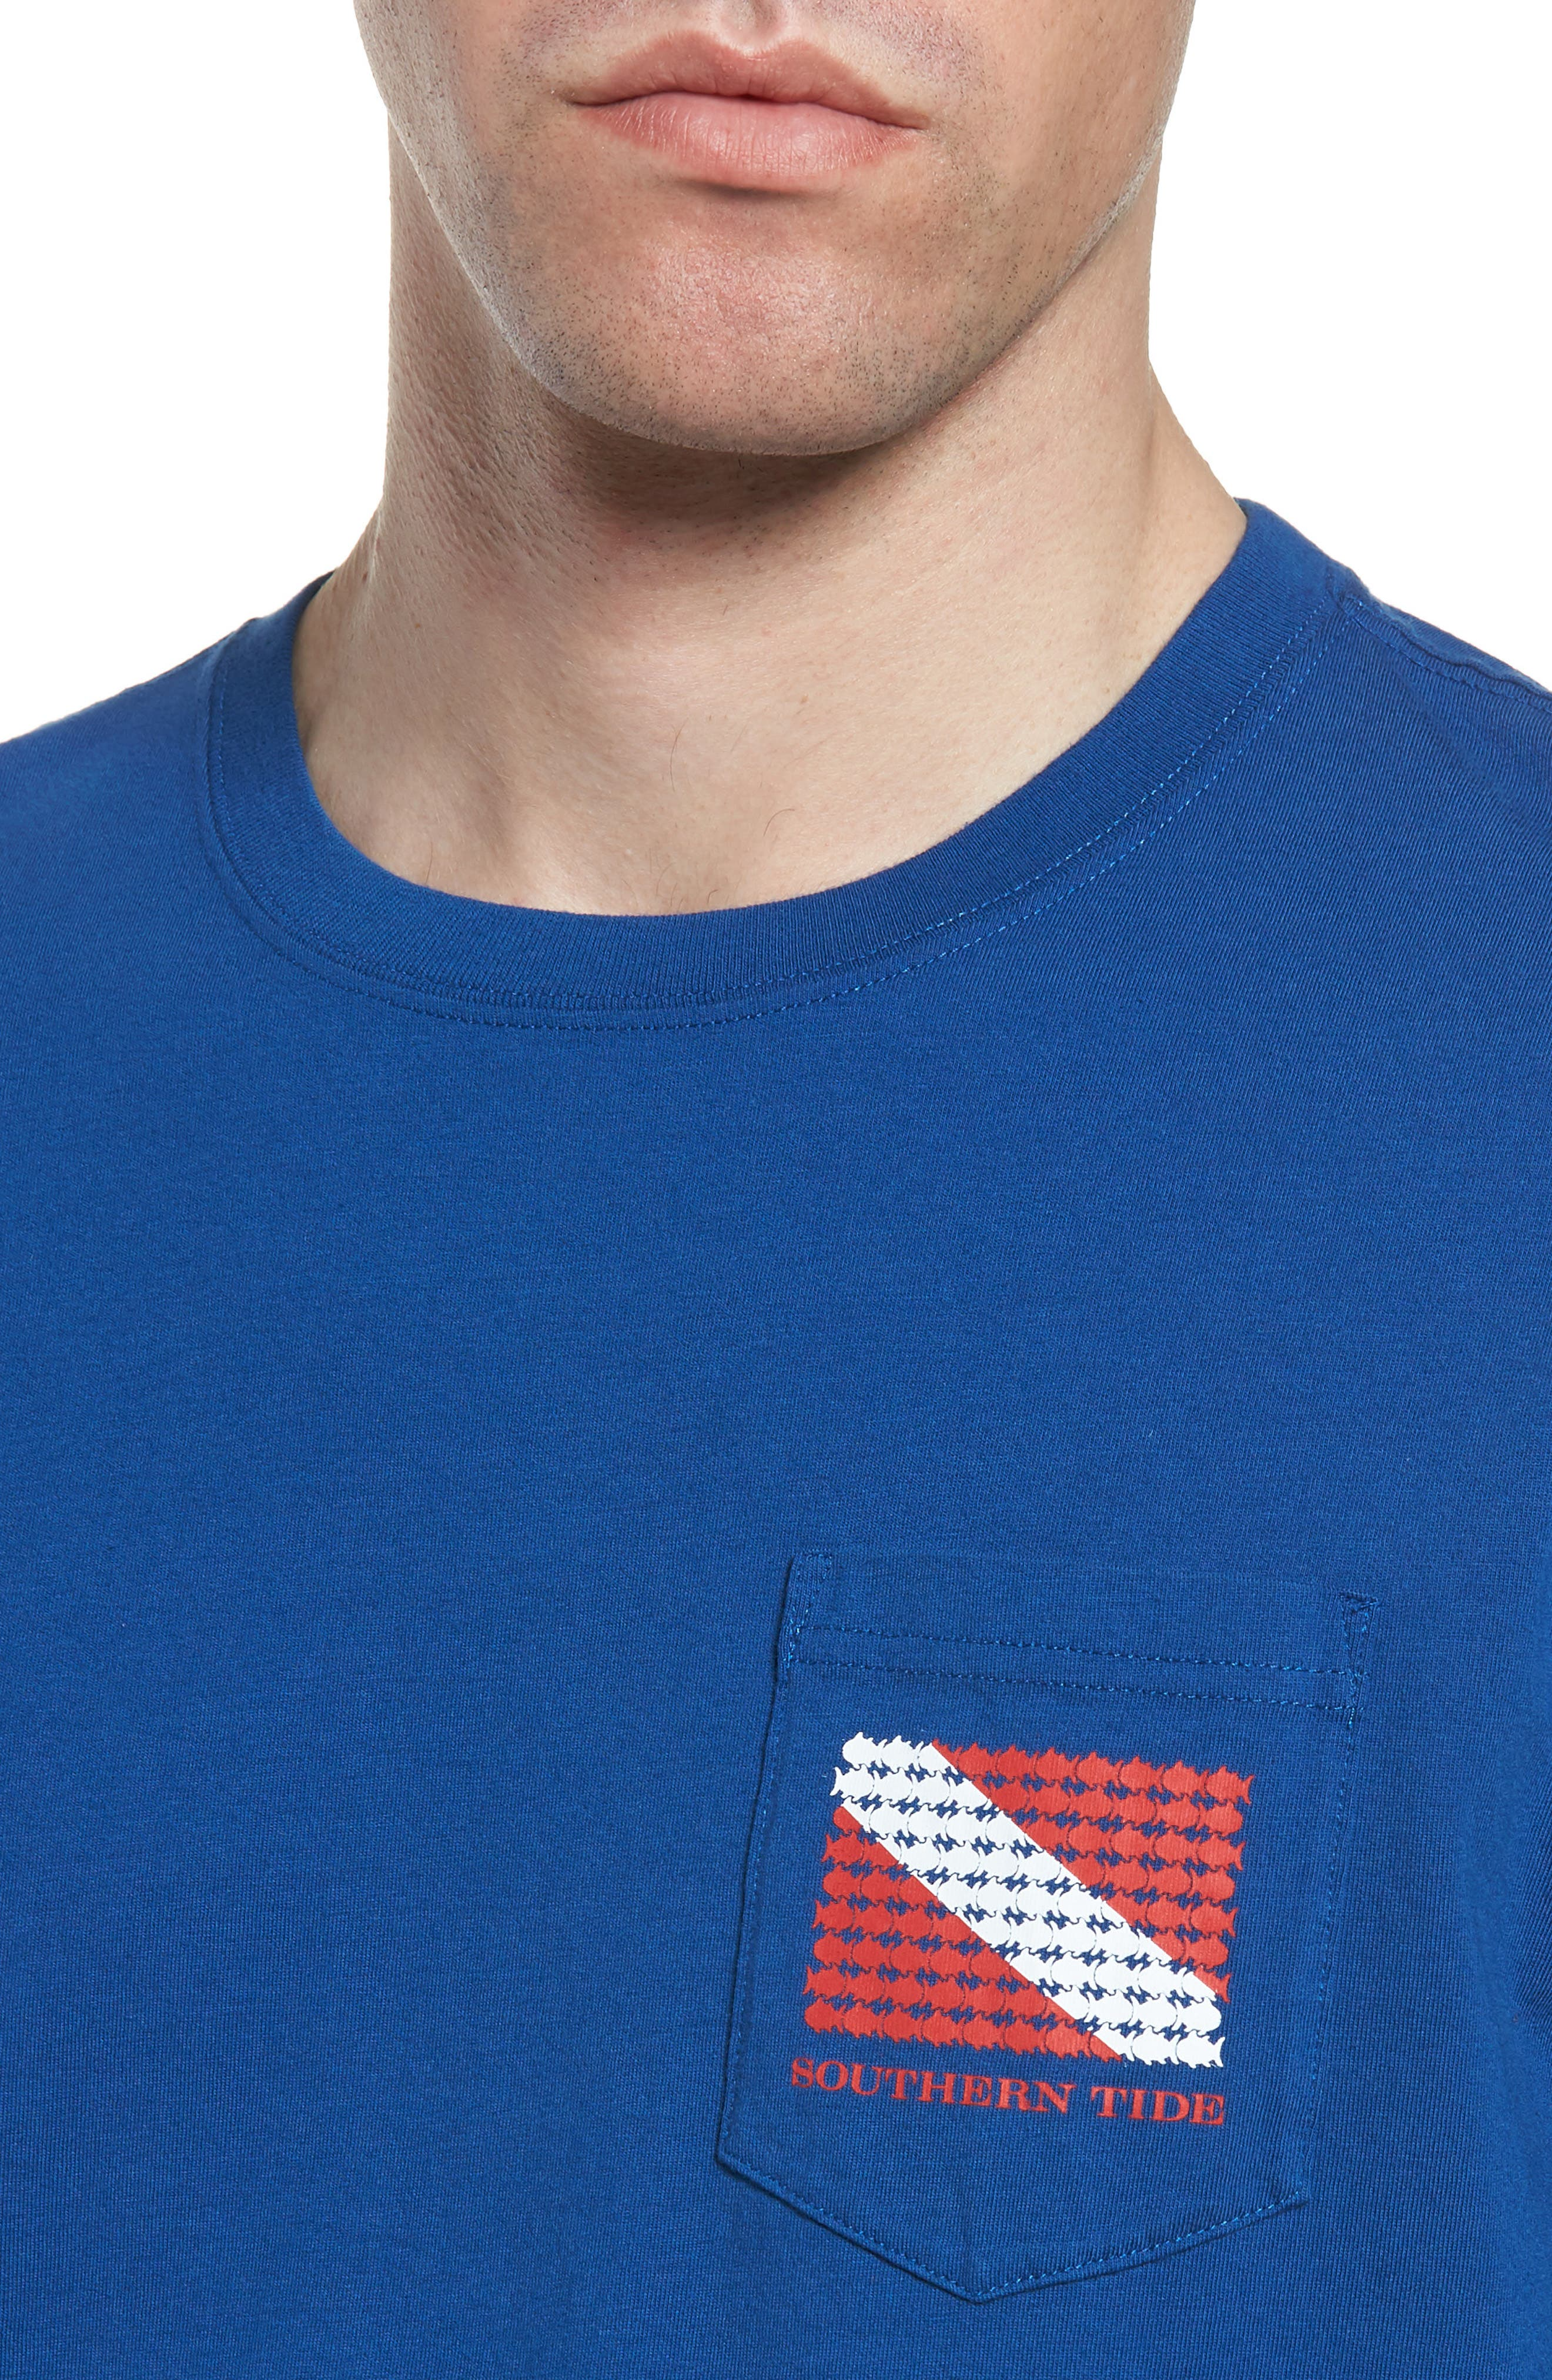 Go Deep Crewneck T-Shirt,                             Alternate thumbnail 4, color,                             Blue Lake